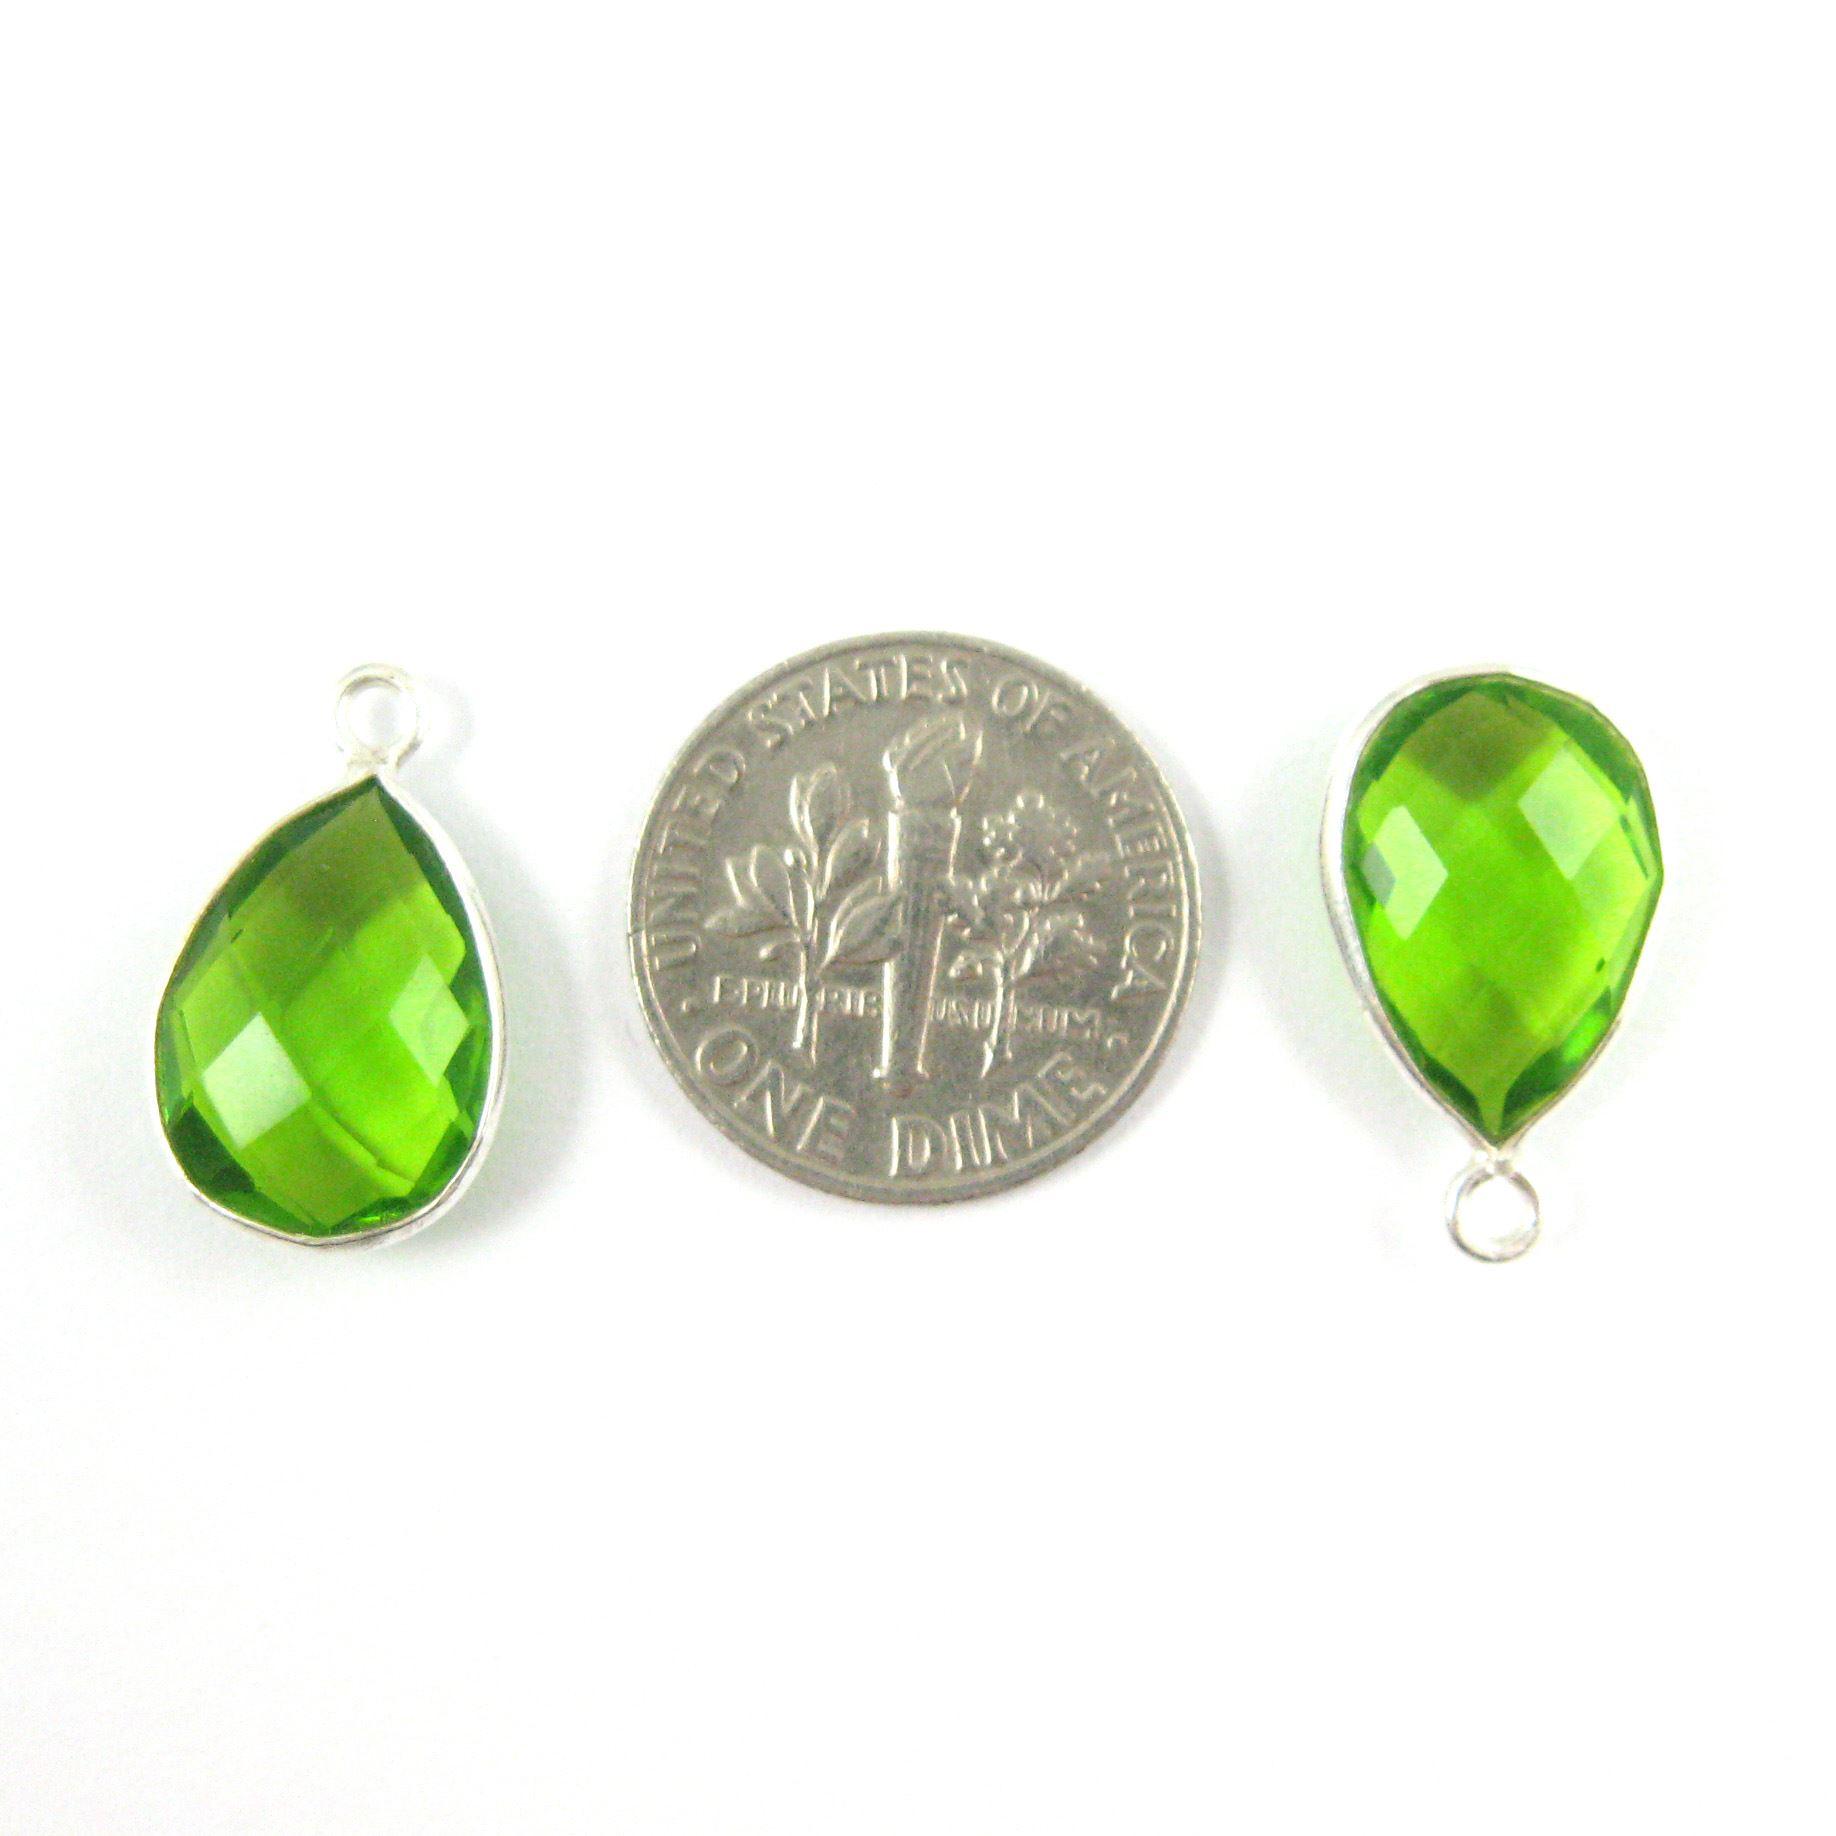 Bezel Gemstone Pendant -Sterling Silver Gem- 10x14mm Faceted Small Teardop Shape -Peridot Quartz  (sold per 2 pieces)